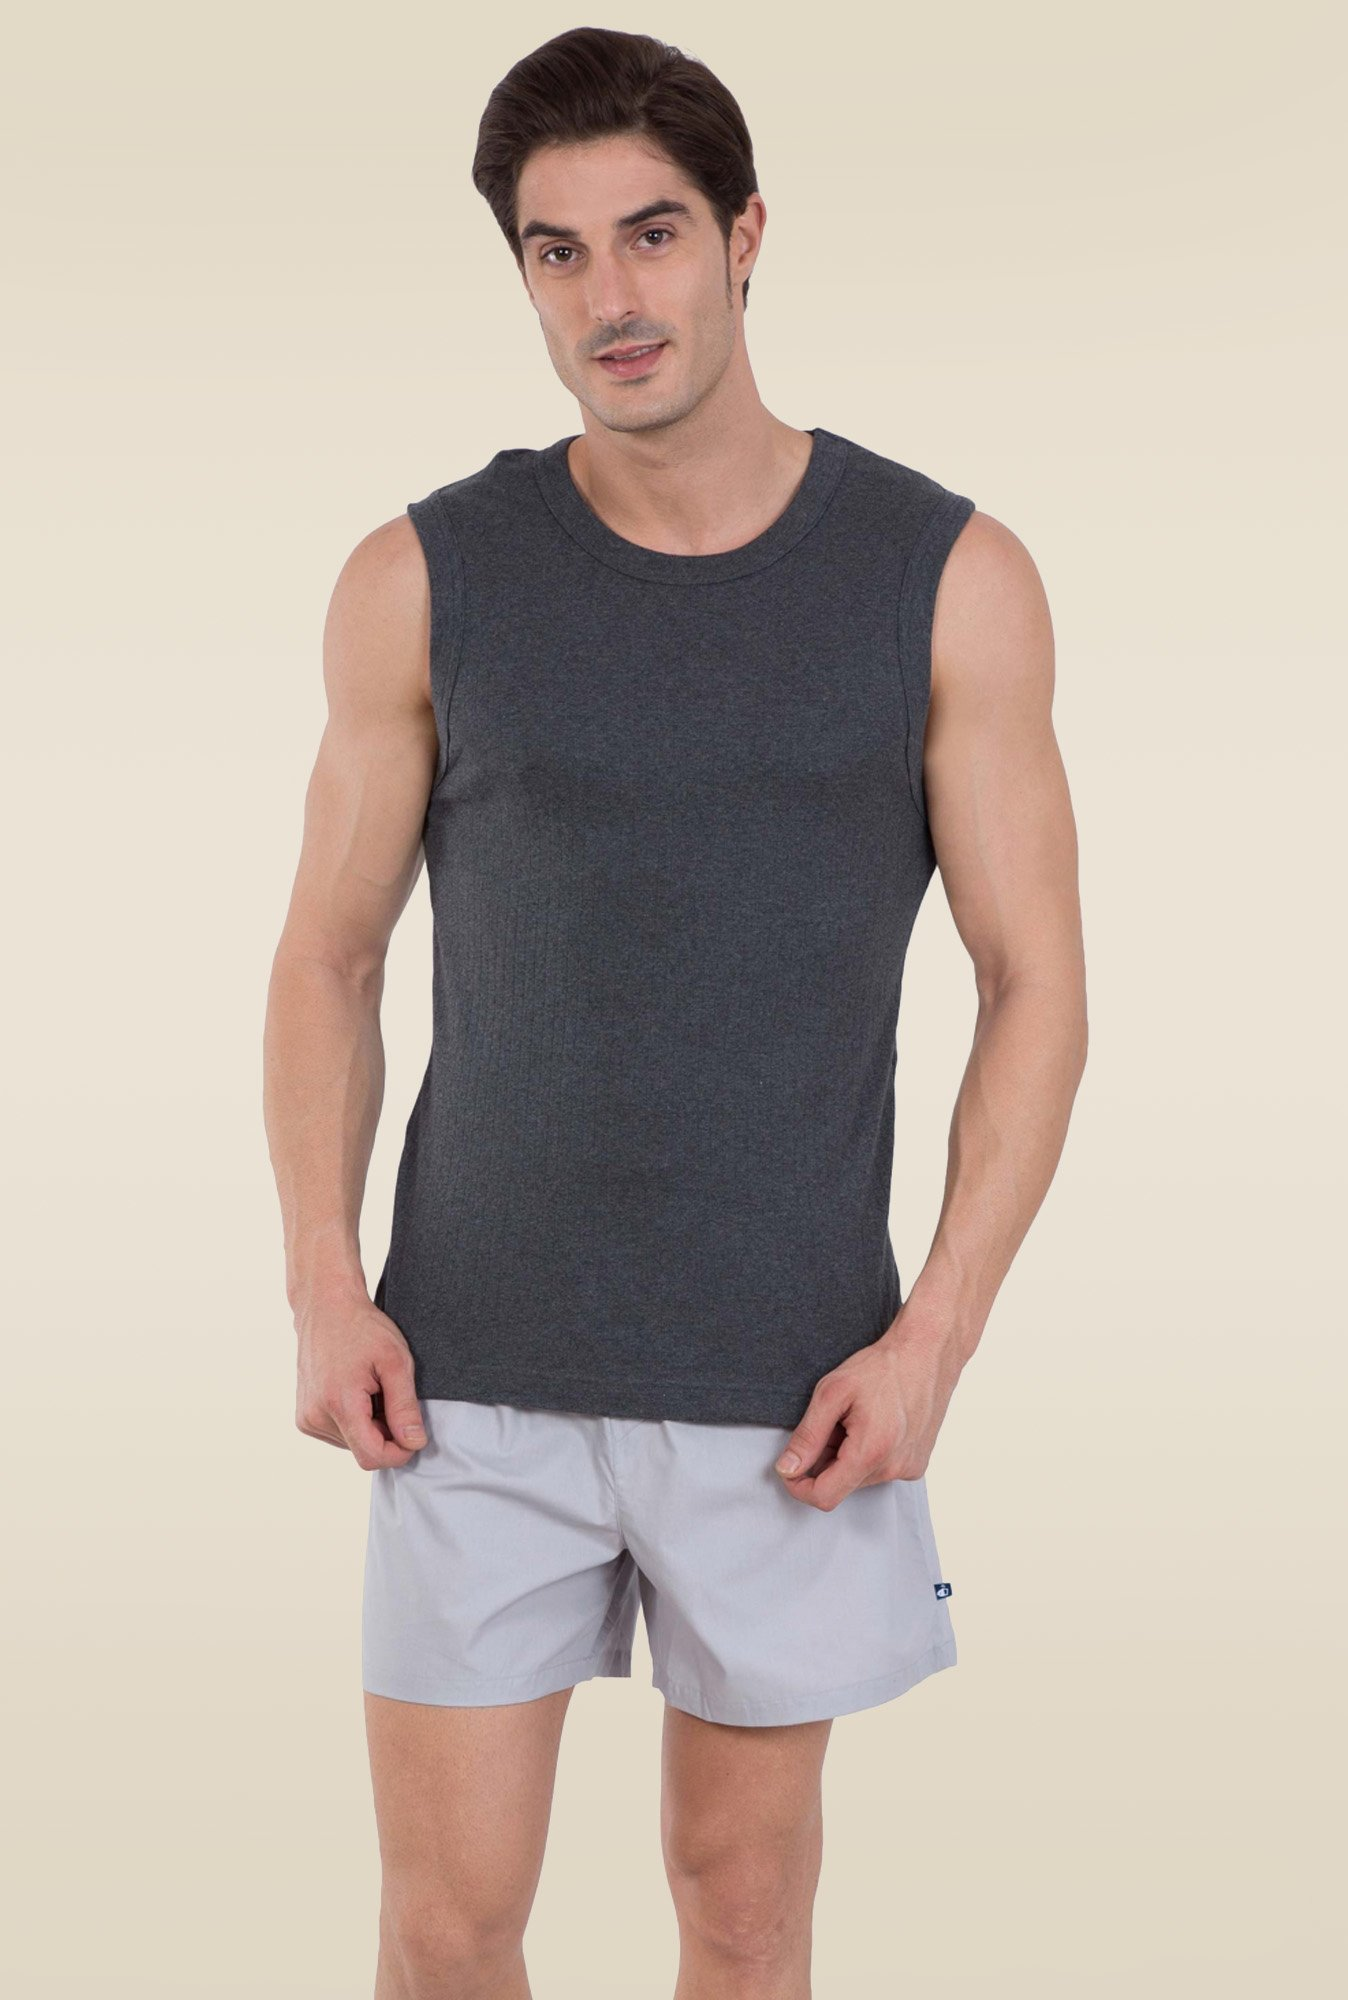 7570c2c23bdaa Buy Jockey Charcoal Melange Muscle Tee - 9930 for Men Online ...